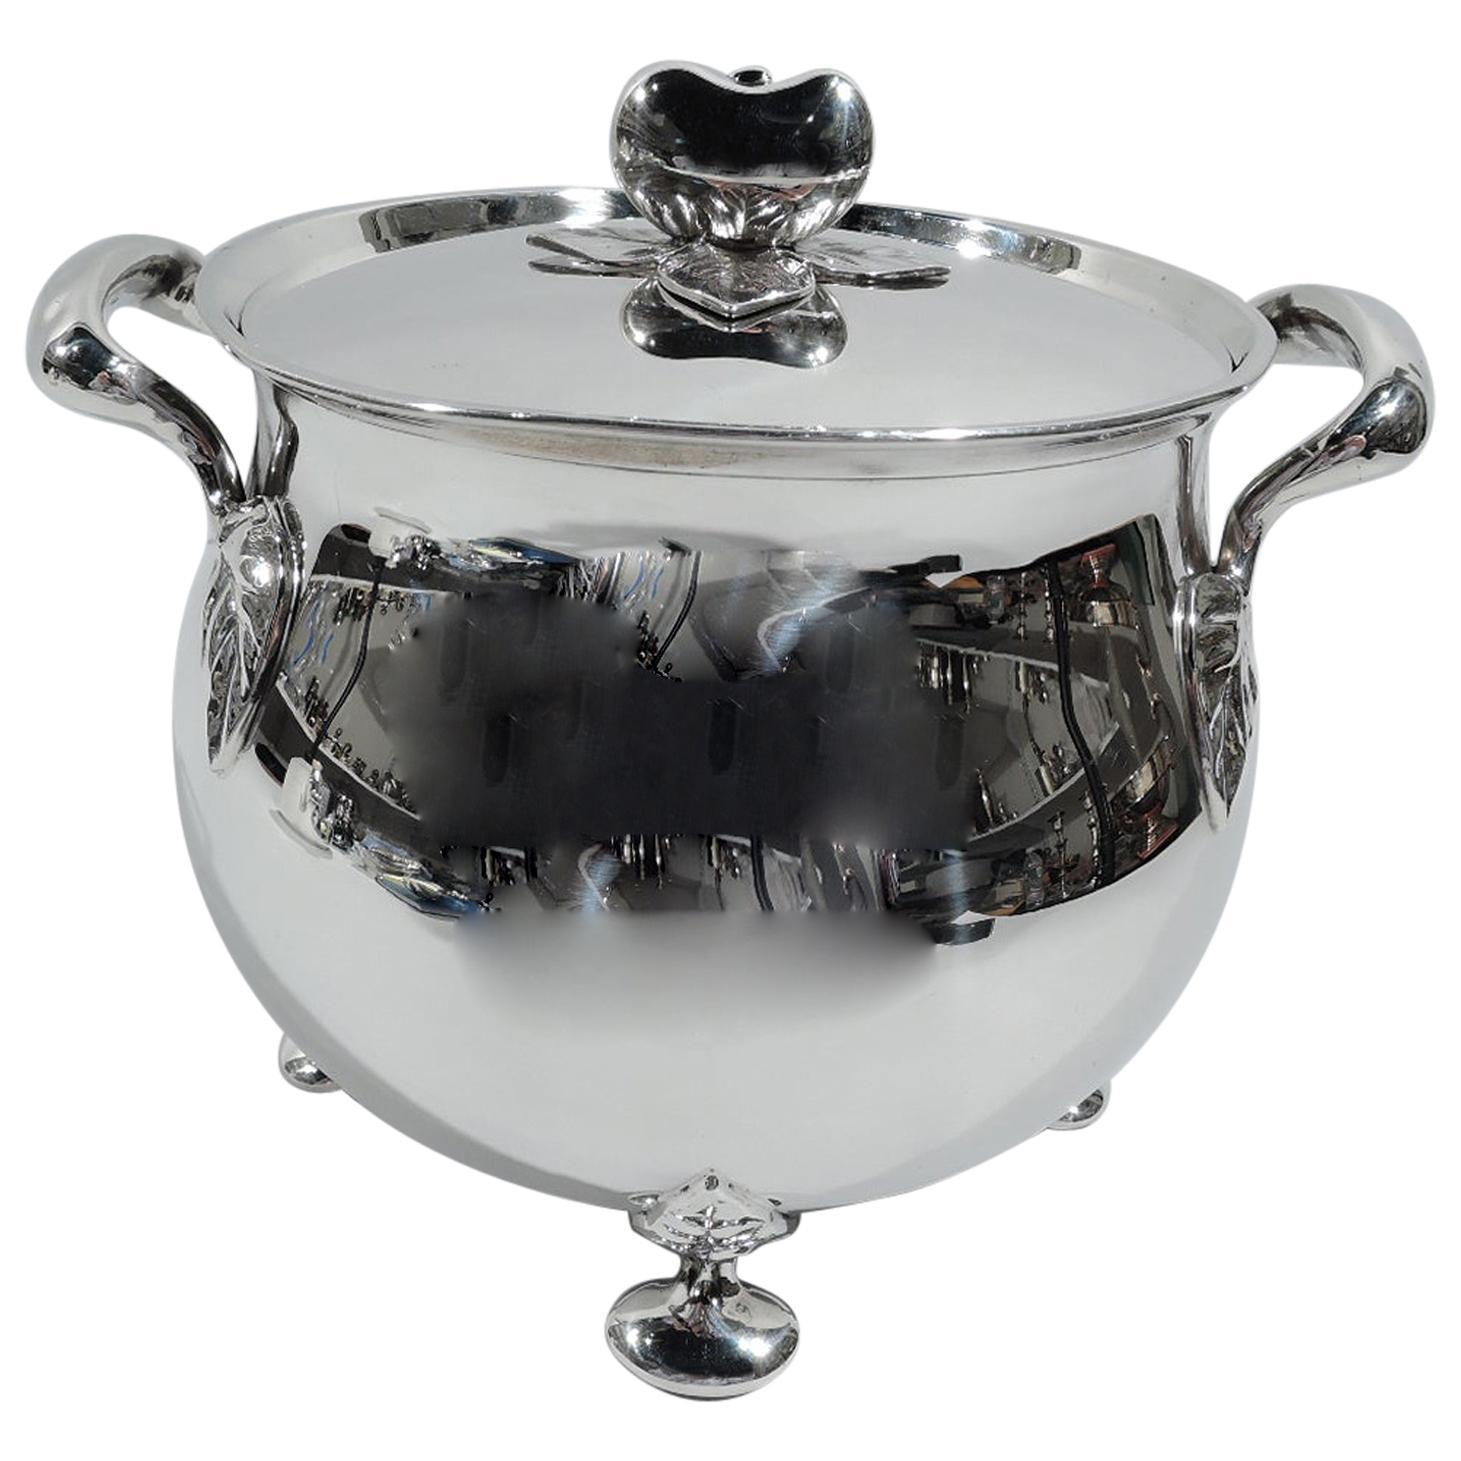 Tiffany English Sterling Silver Ice Bucket